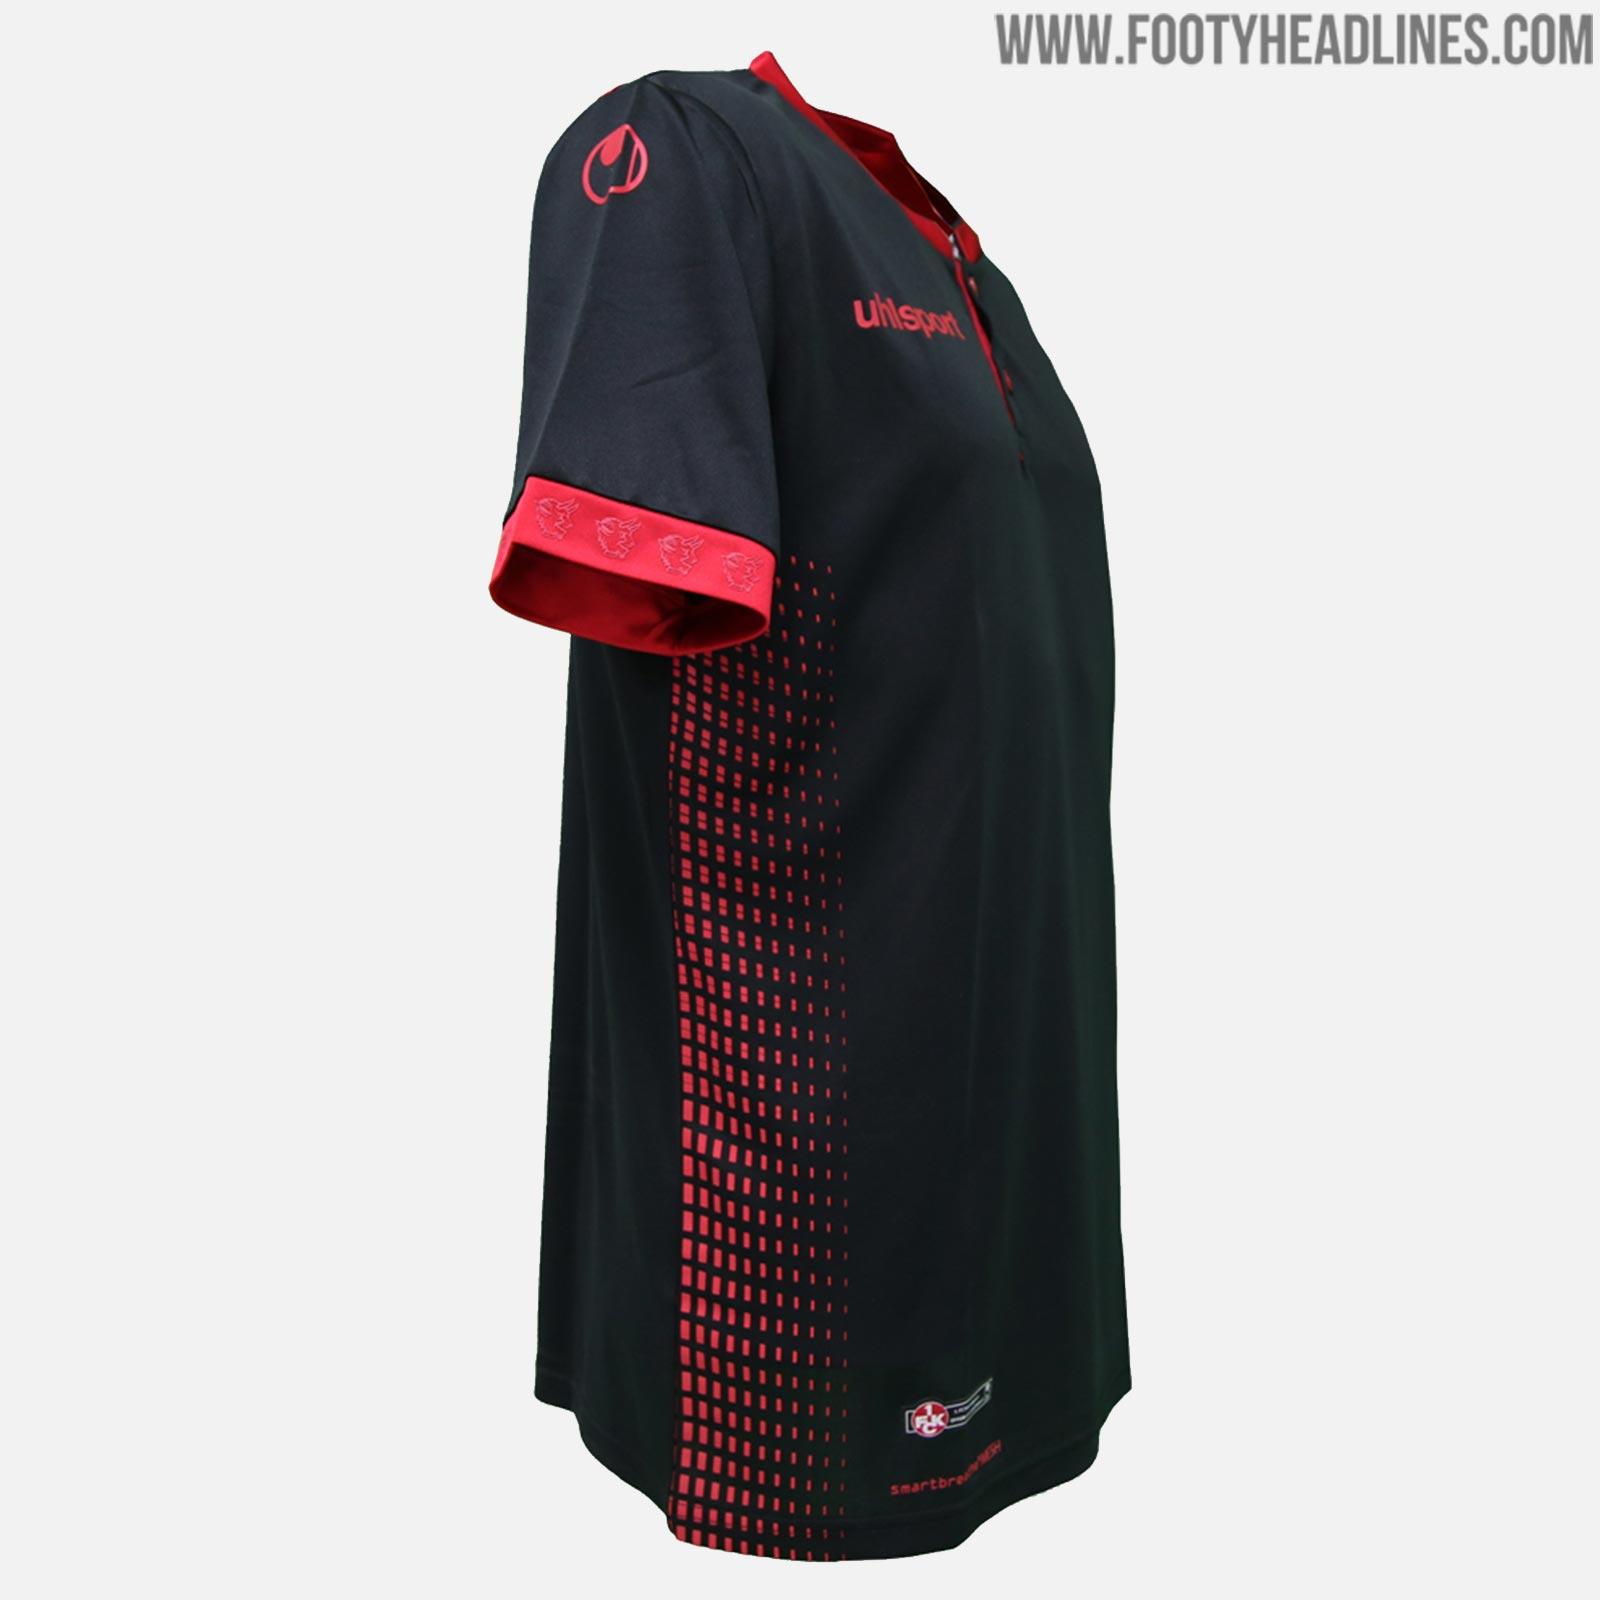 45fcc0b19bf Based on Uhlsport s kit template for the 2018-19 season